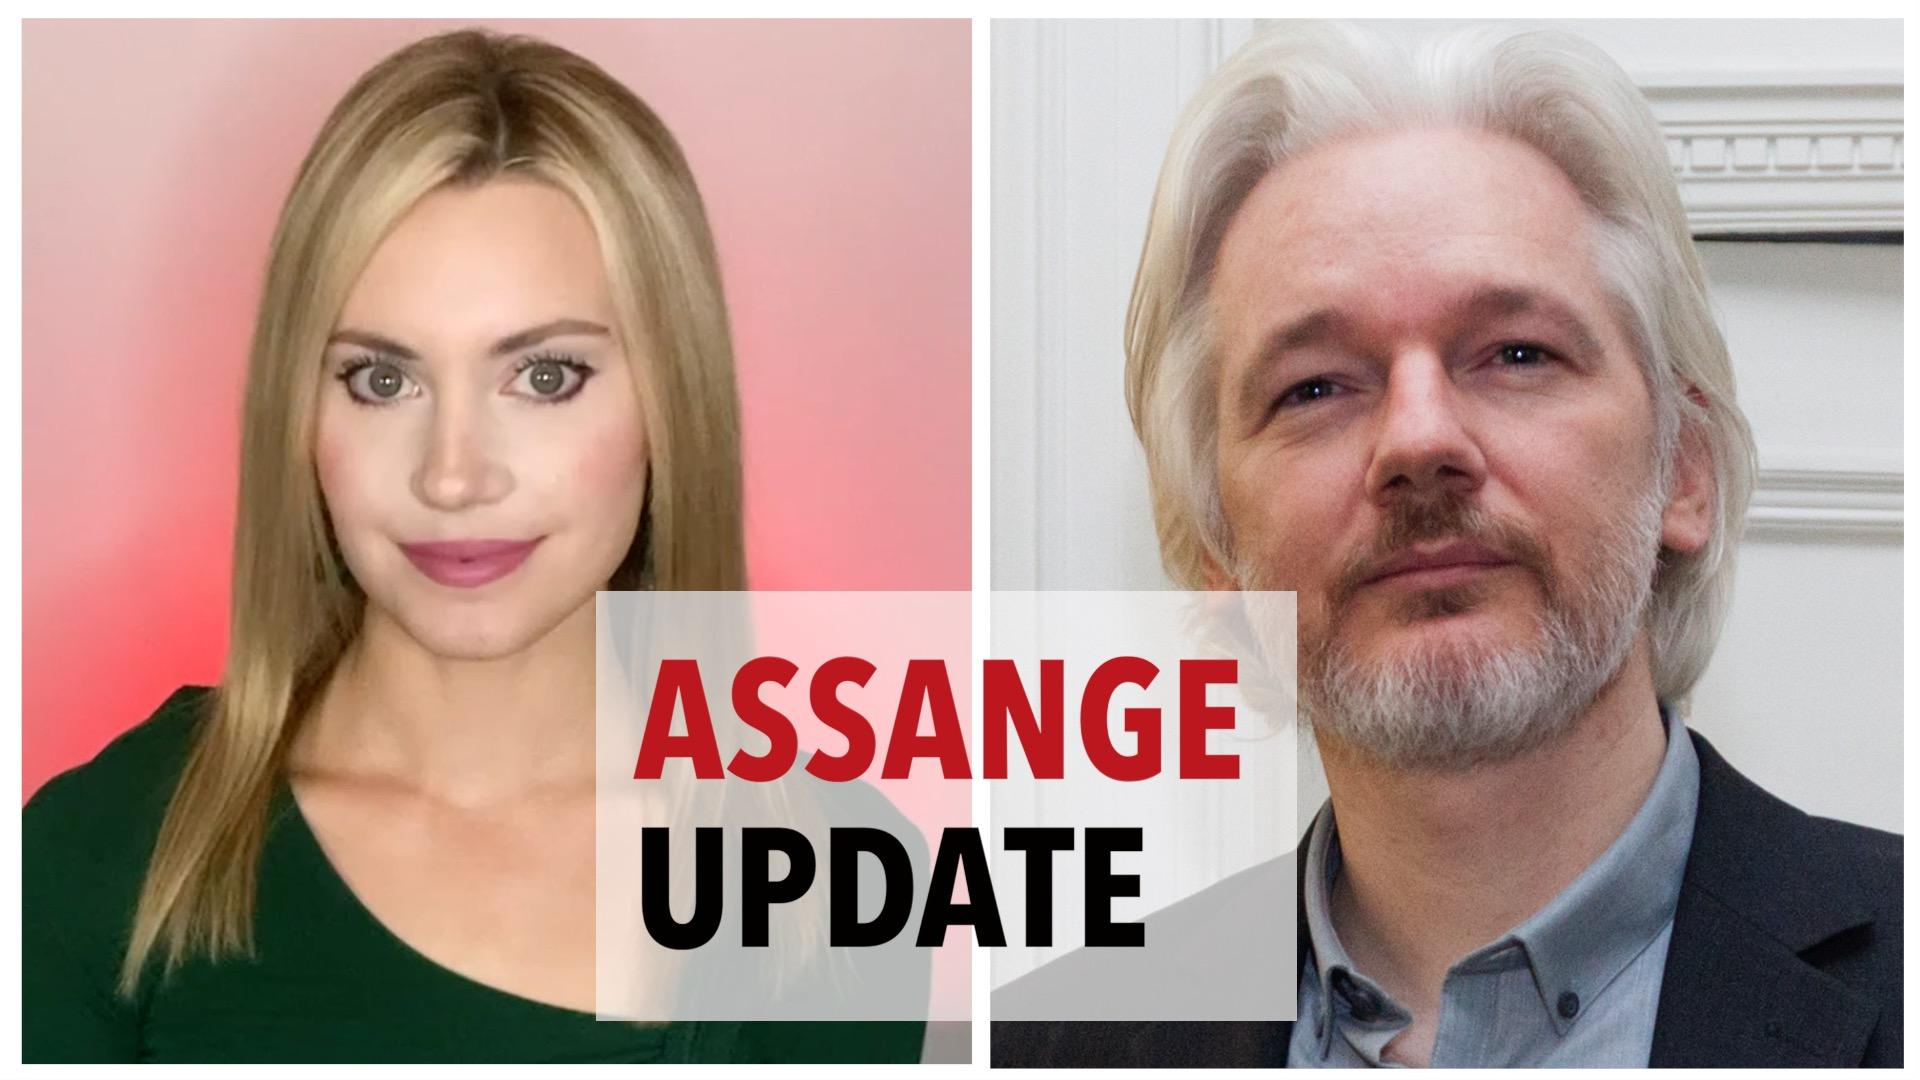 Assange Update: New Audio Recordings expose weak US case